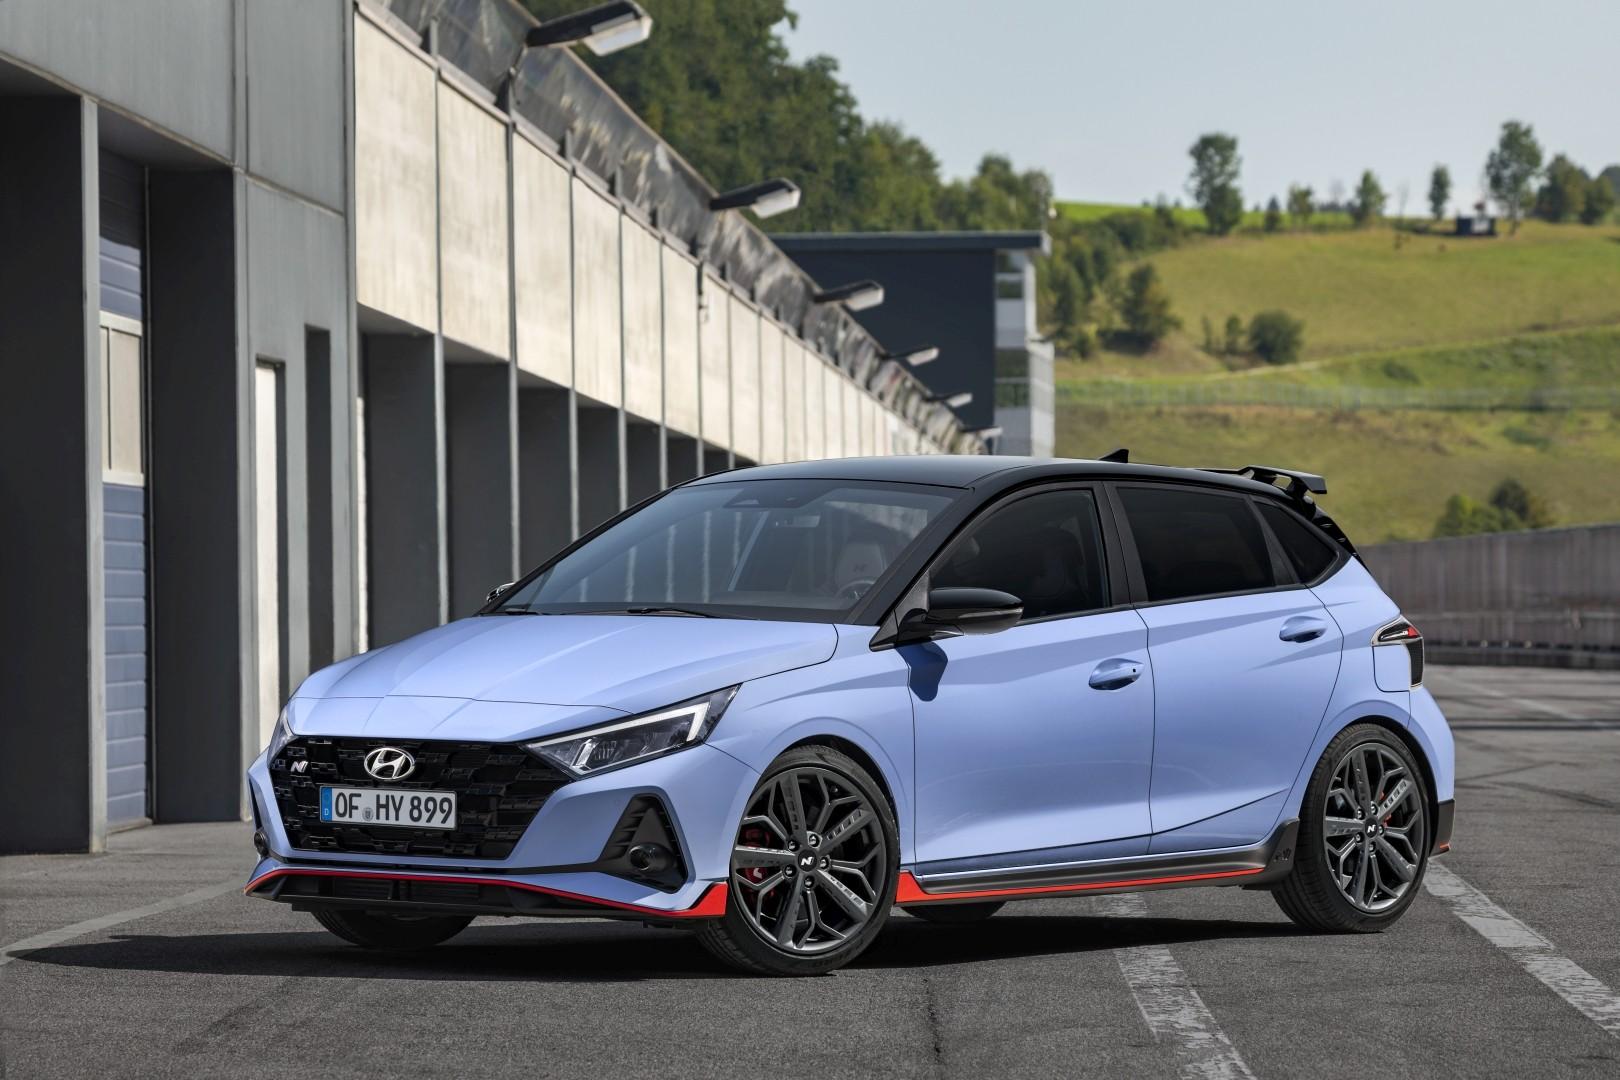 Kelebihan Toyota I20 Perbandingan Harga